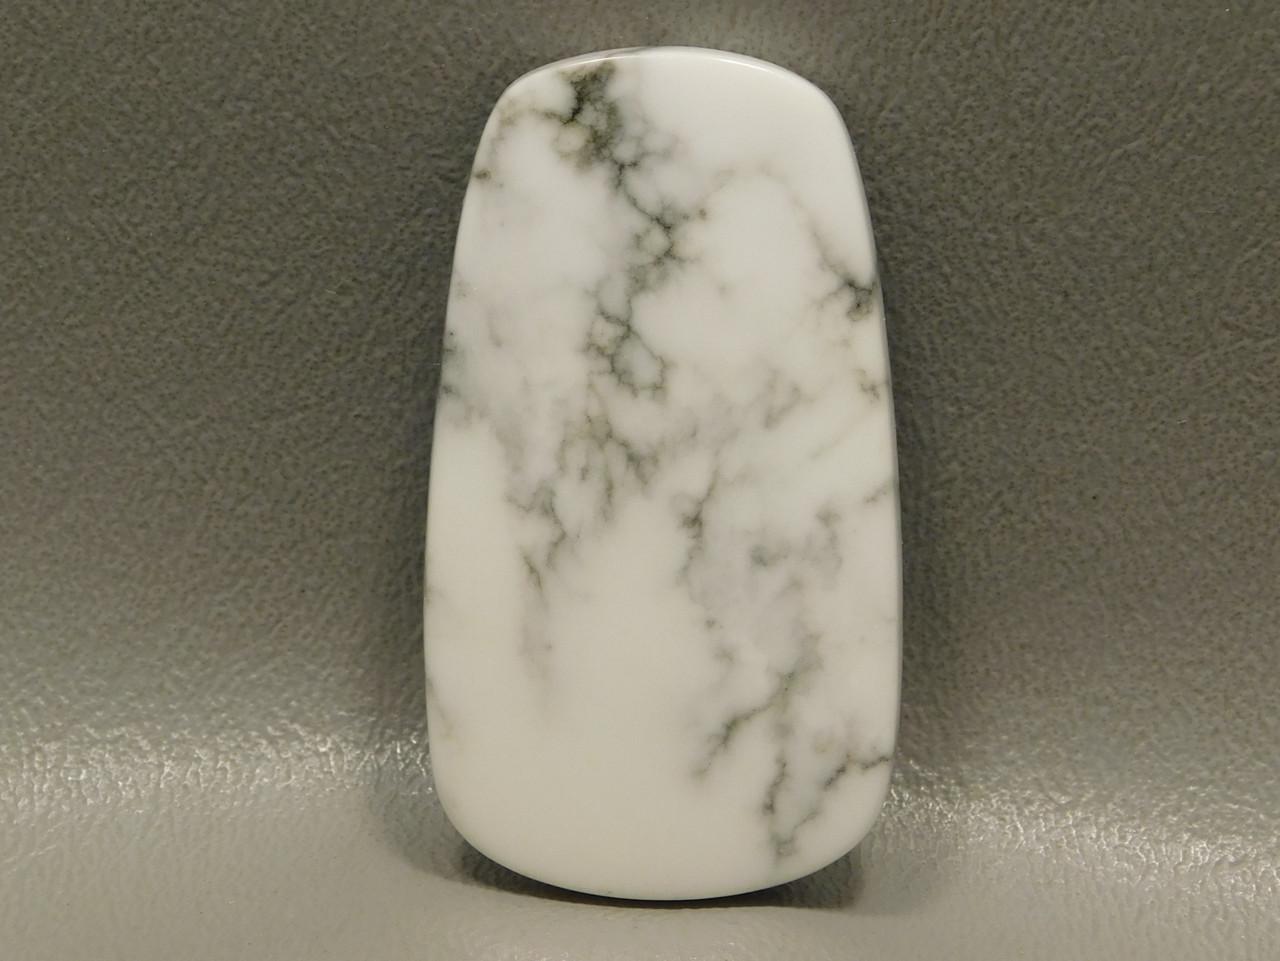 Designer Cabochon Stone White Howlite Tick Canyon California #17